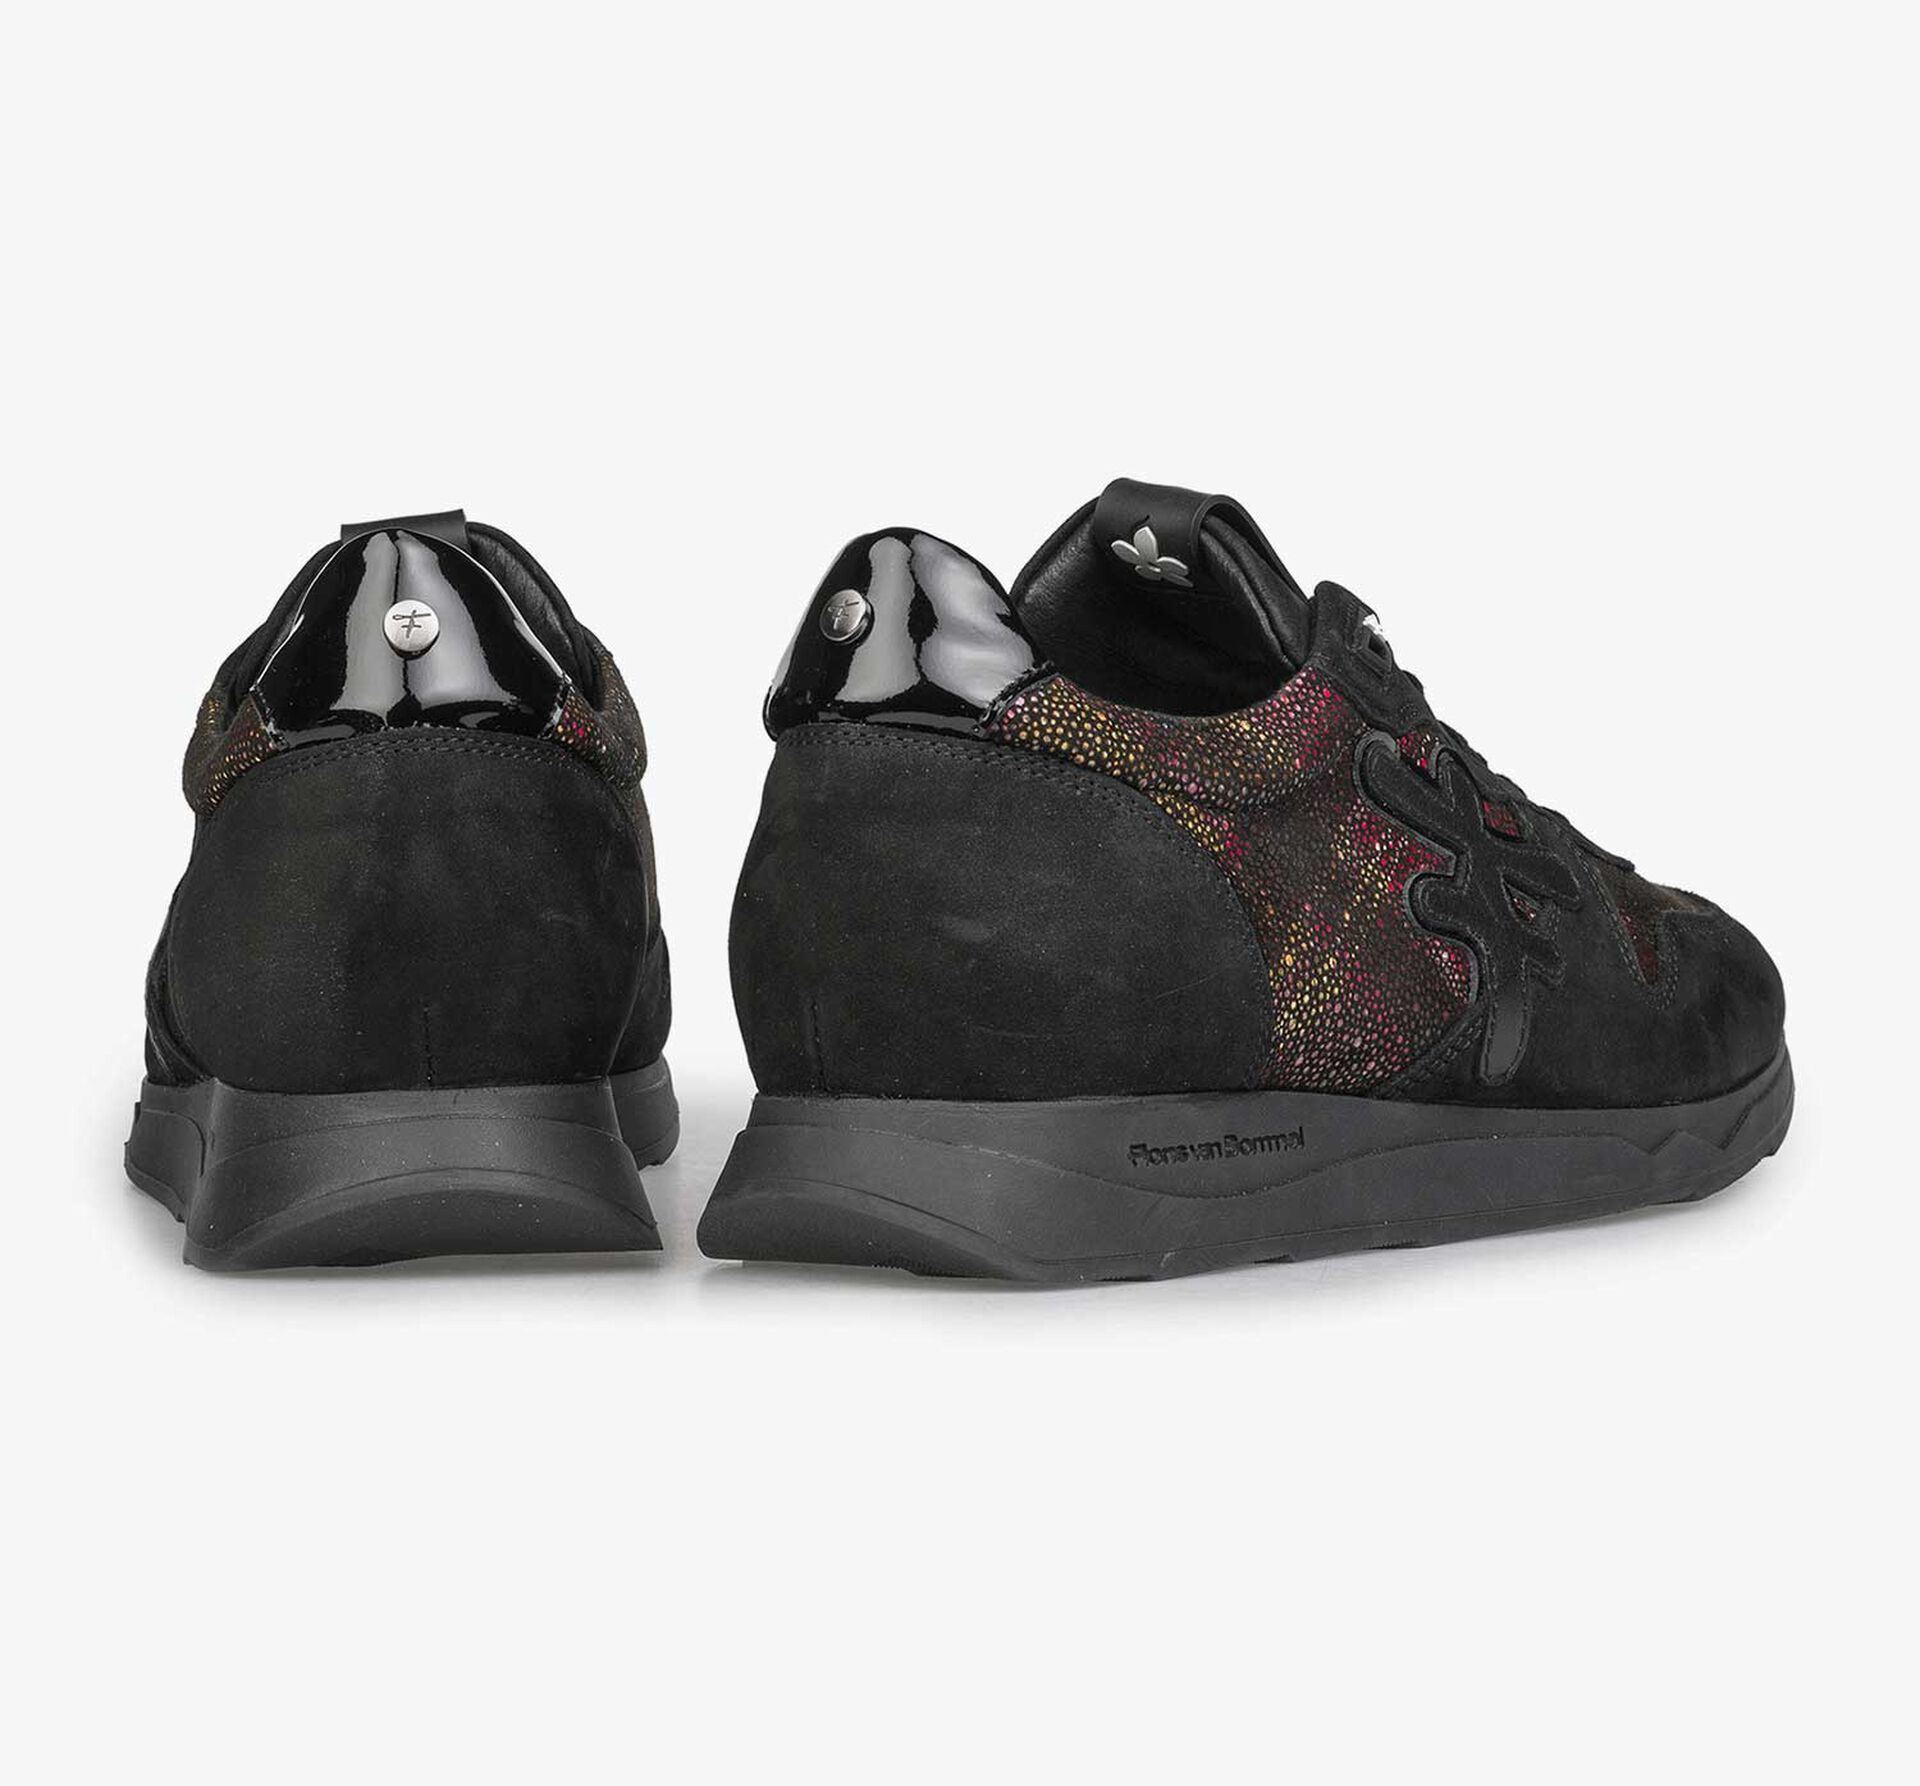 Schwarzer Leder-Sneaker mit Karomuster